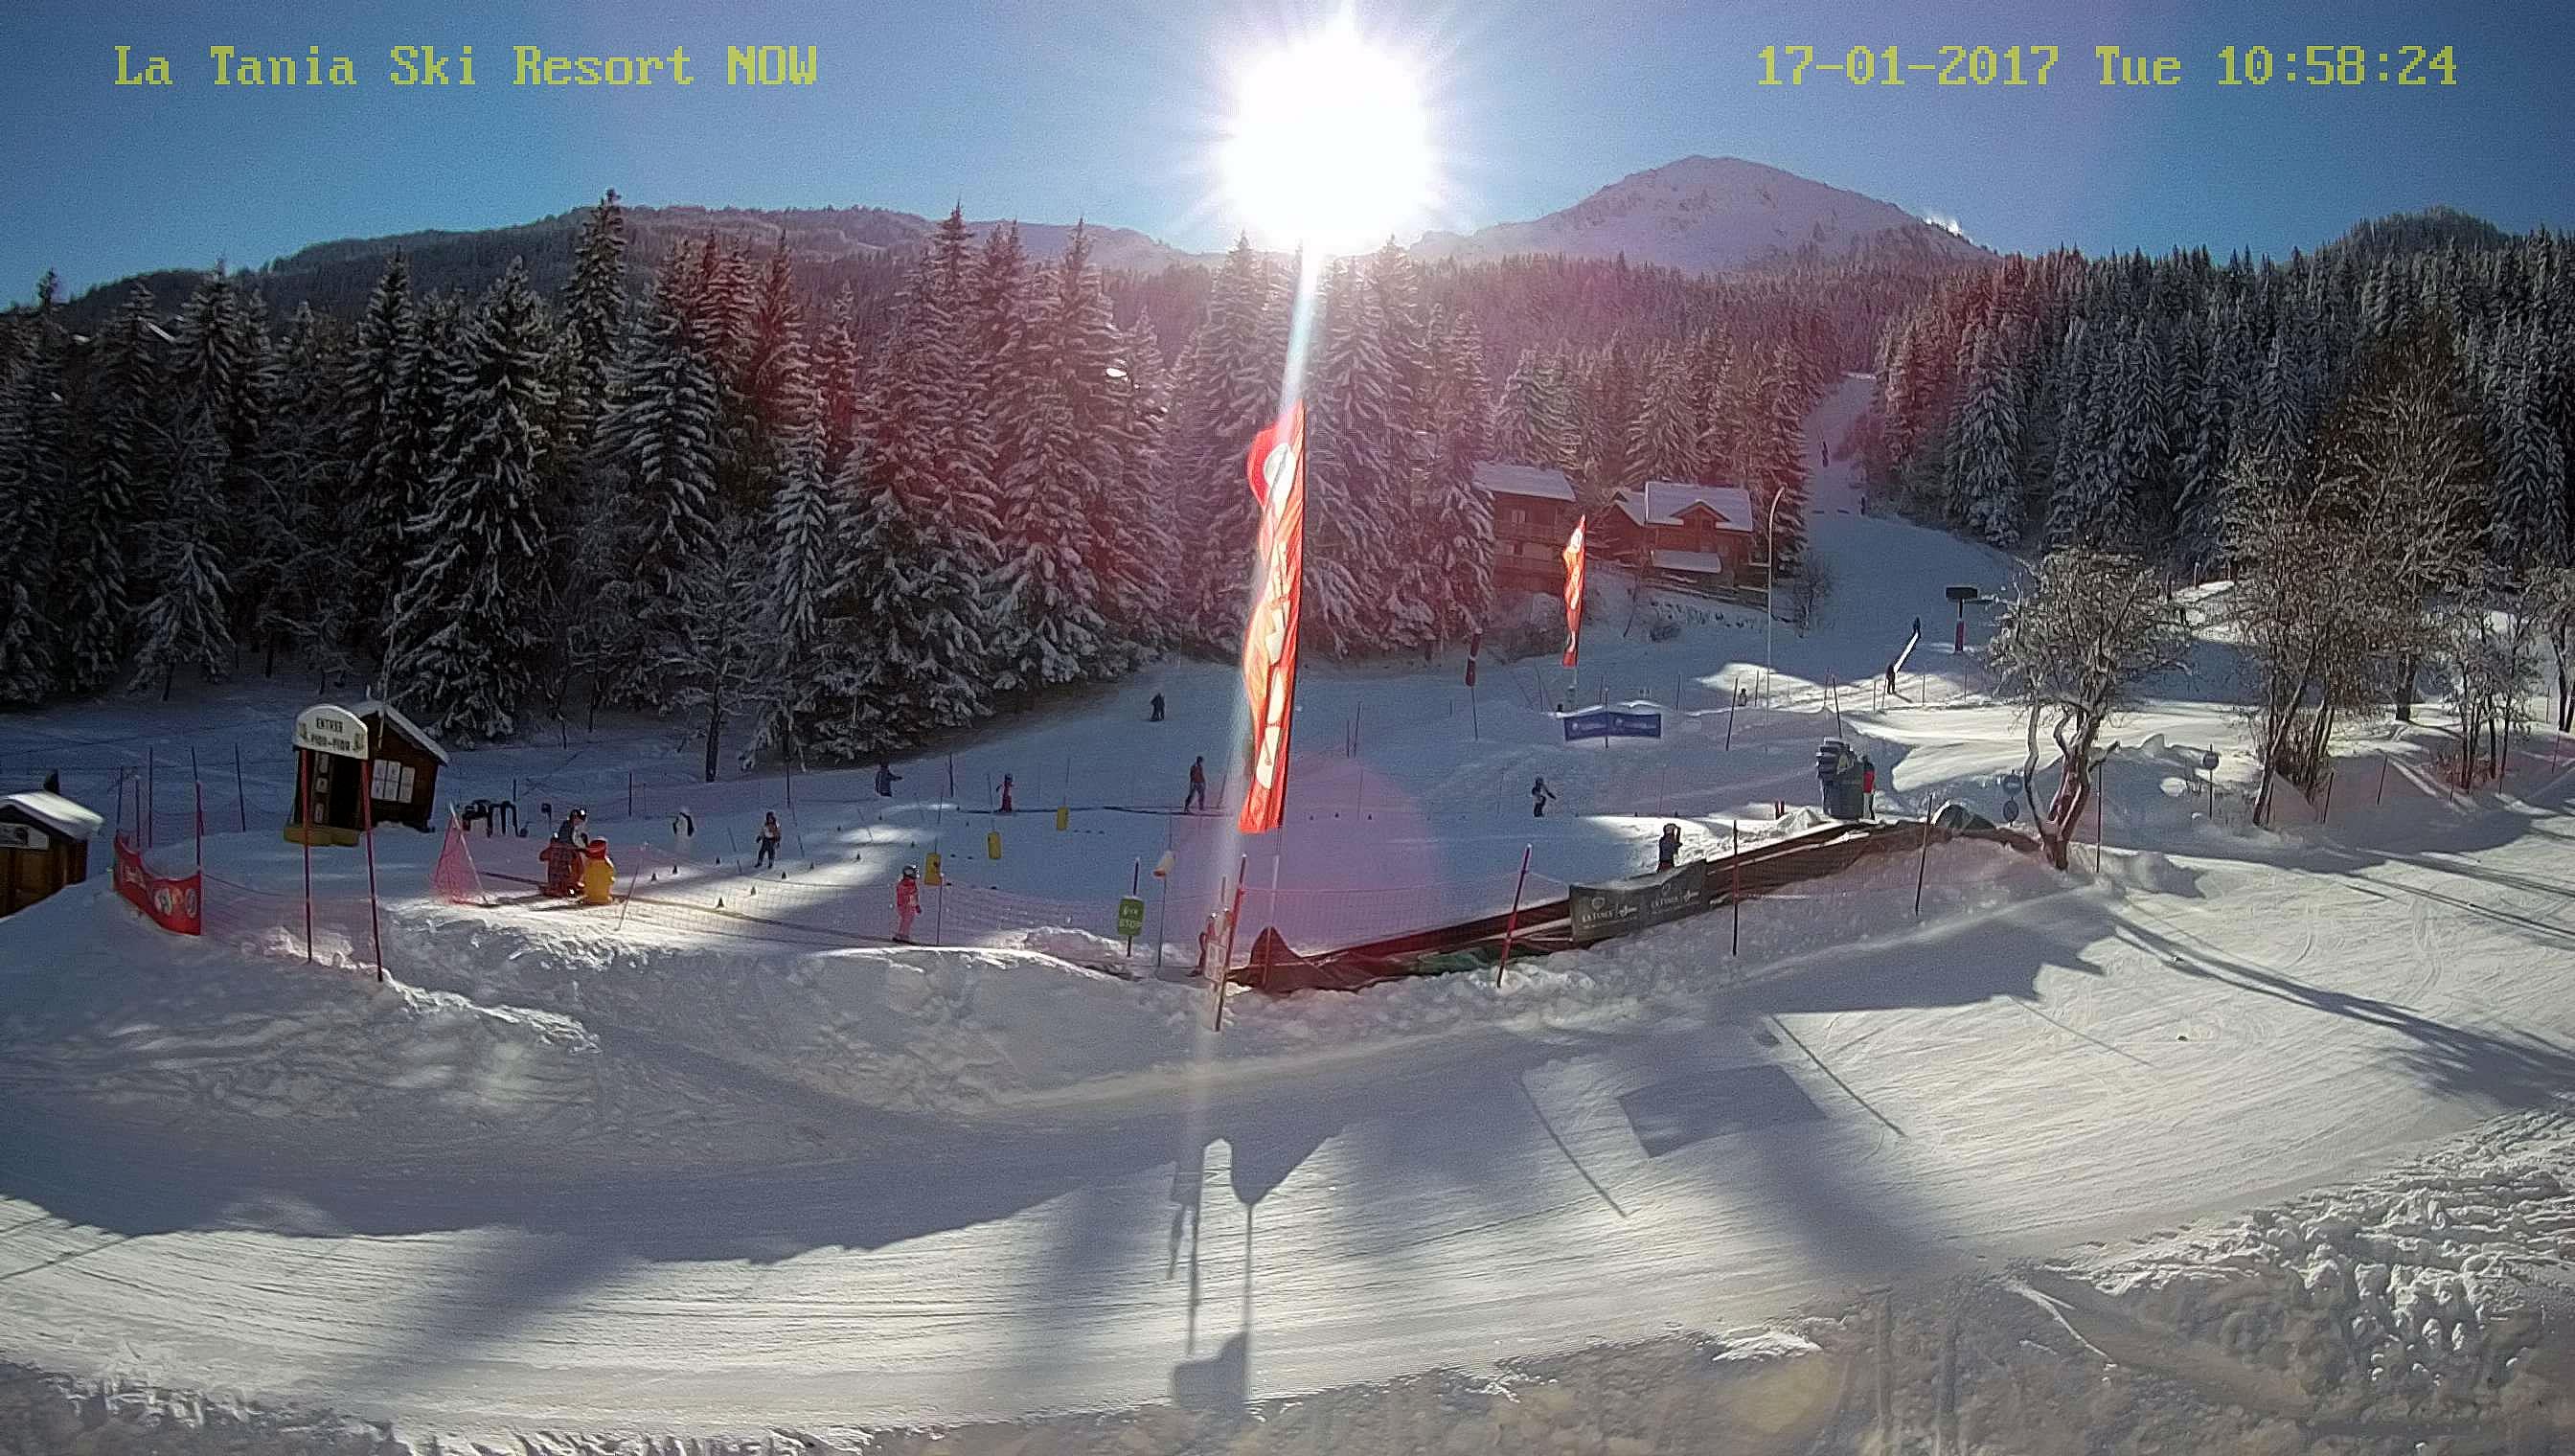 la tania - latania.co.uk - la tania ski resort, skiing snowboard